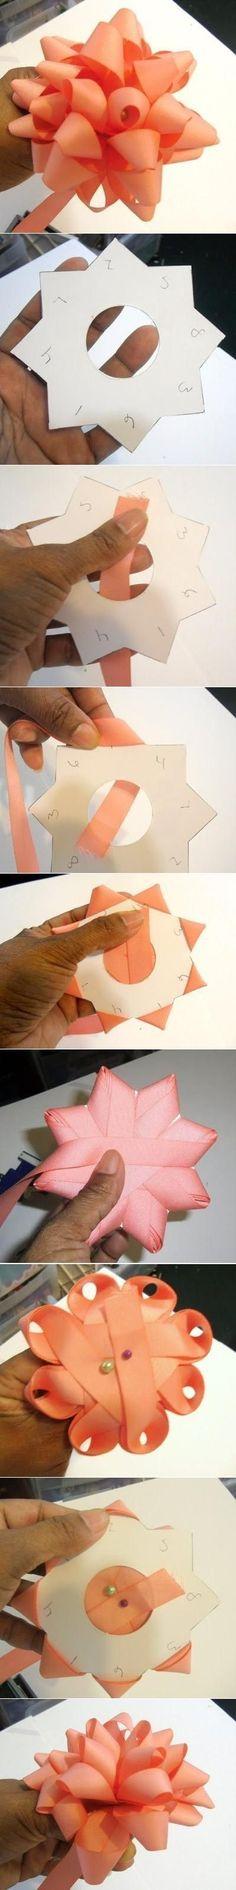 DIY Bow of Ribbon DIY Projects / UsefulDIY.com